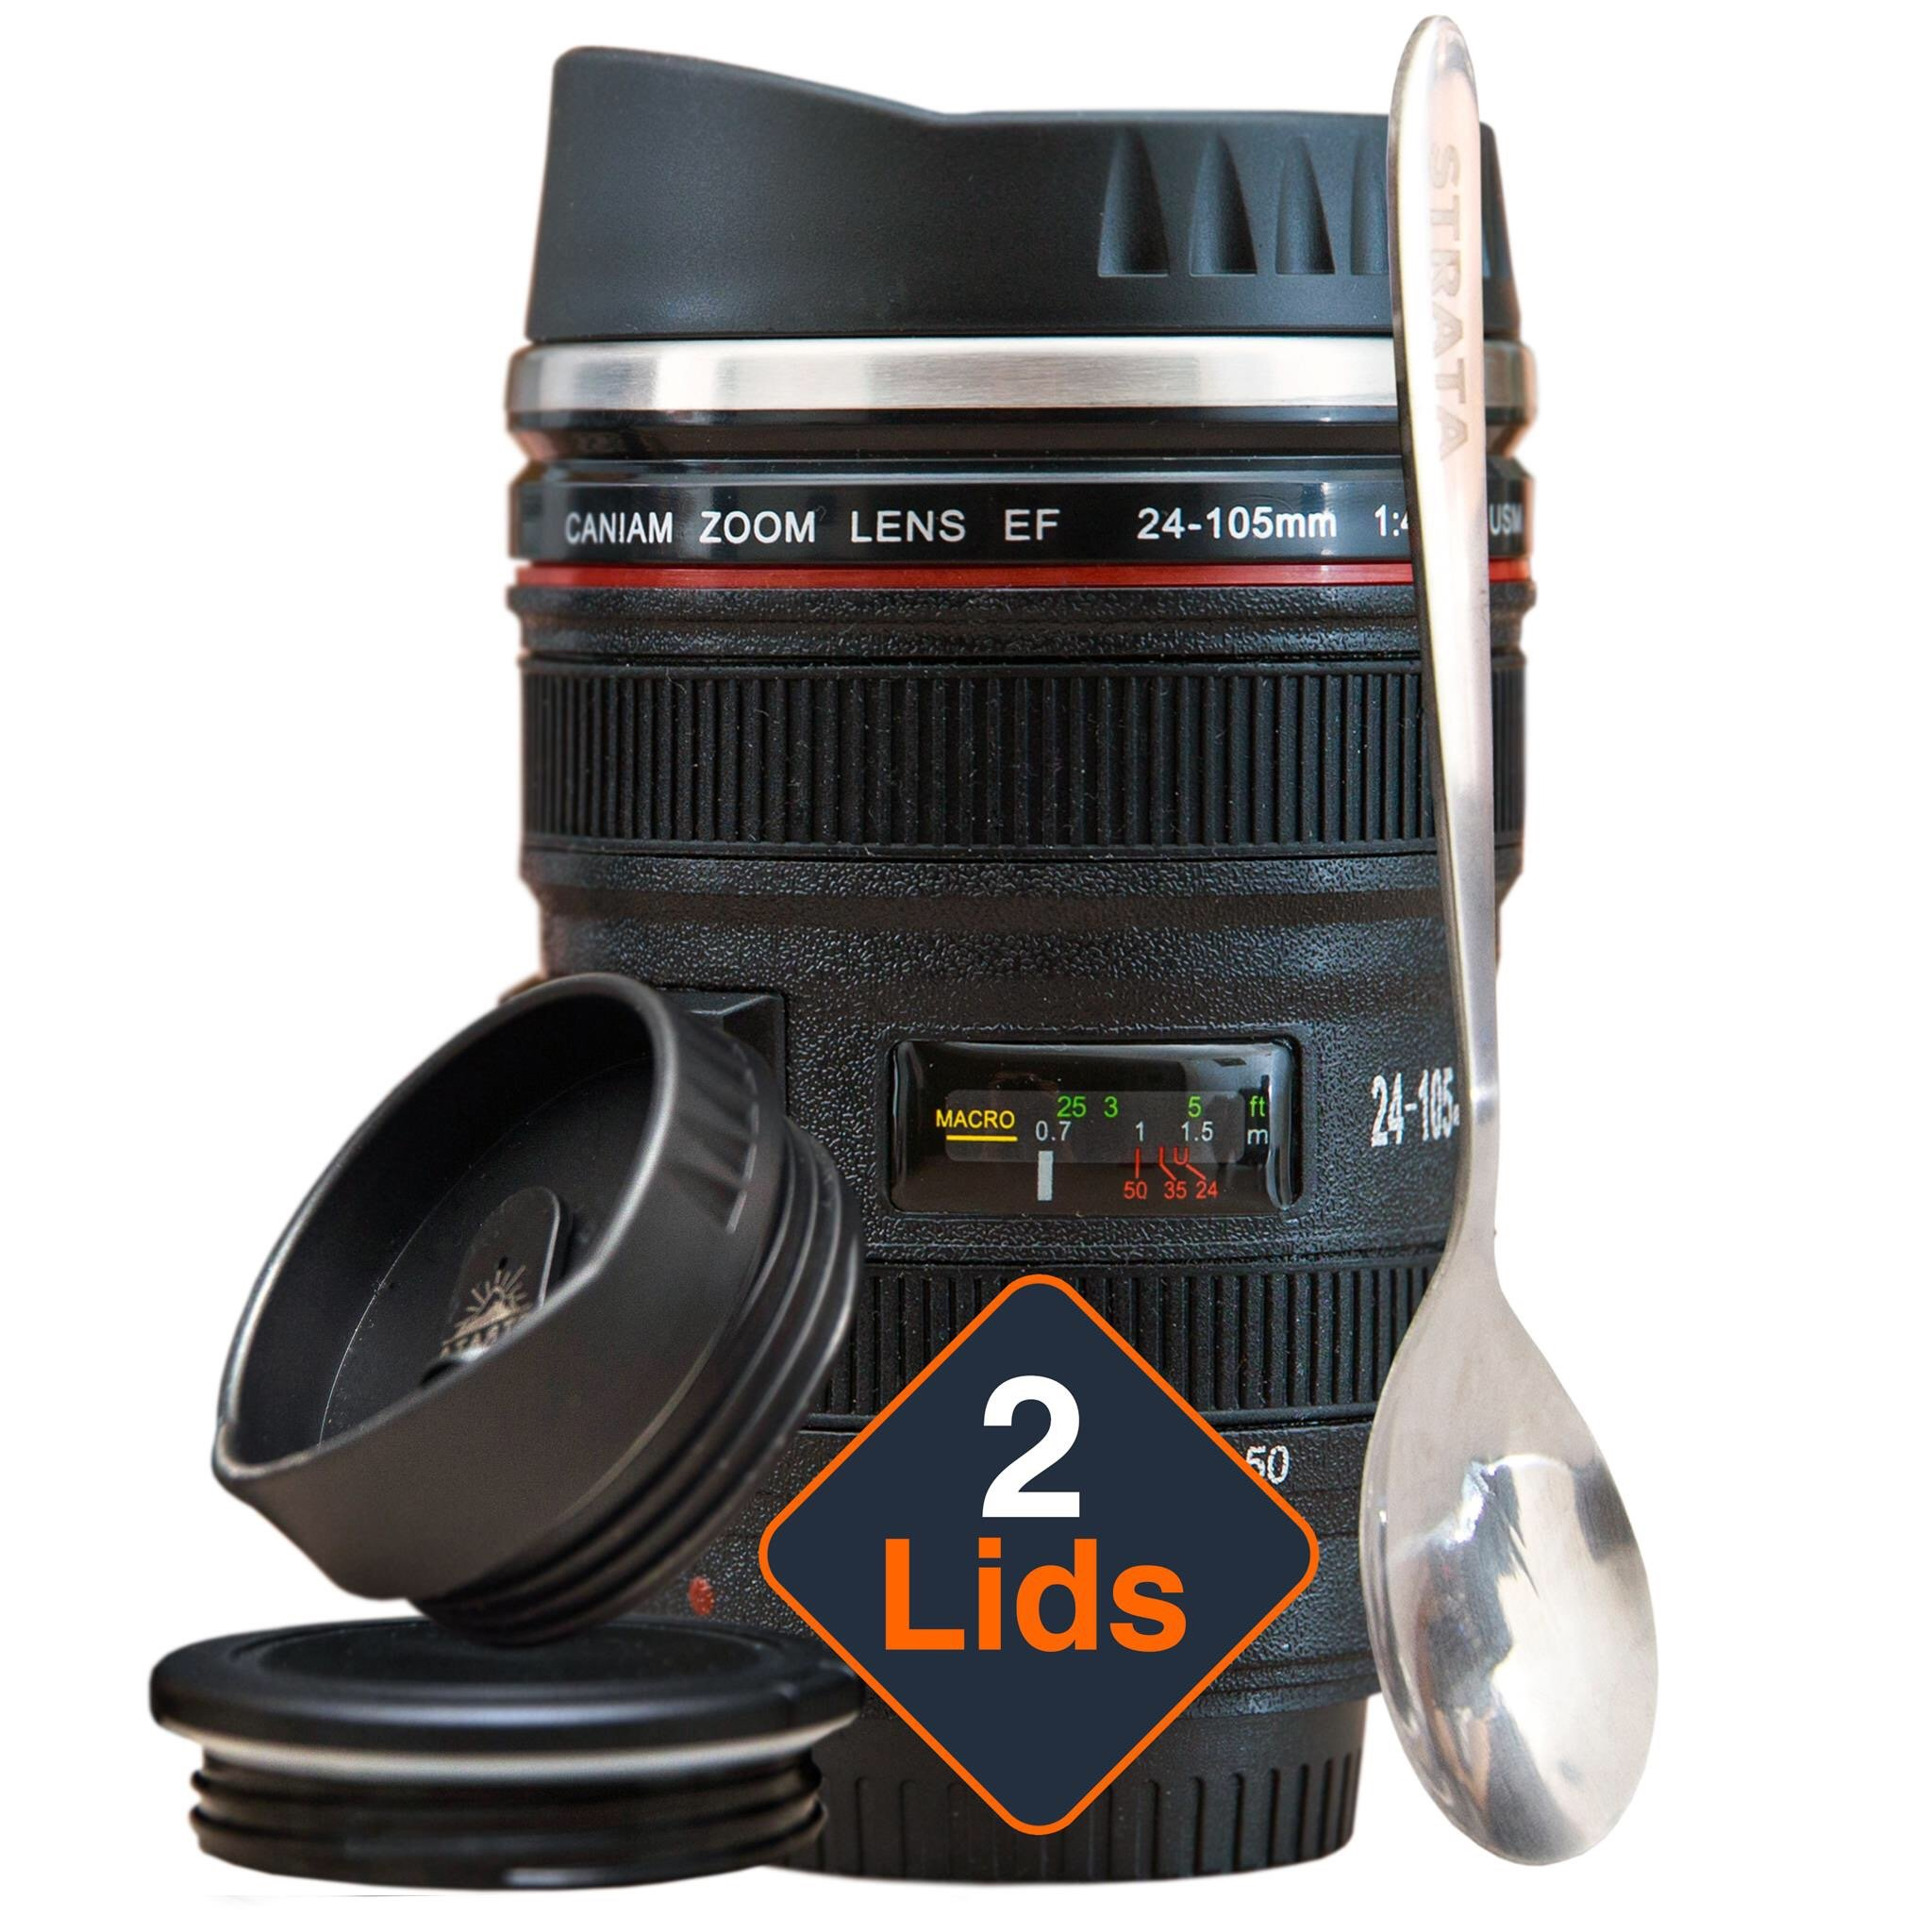 STRATA CUPS Camera Lens Coffee Mug -13.5oz, SUPER BUNDLE! (2 LIDS + SPOON) Stainless Steel Thermos, Sealed & Retractable Lids! Photographer Camera Mug, Travel Coffee Cup, Coffee Mugs for Men, Women by STRATA CUPS